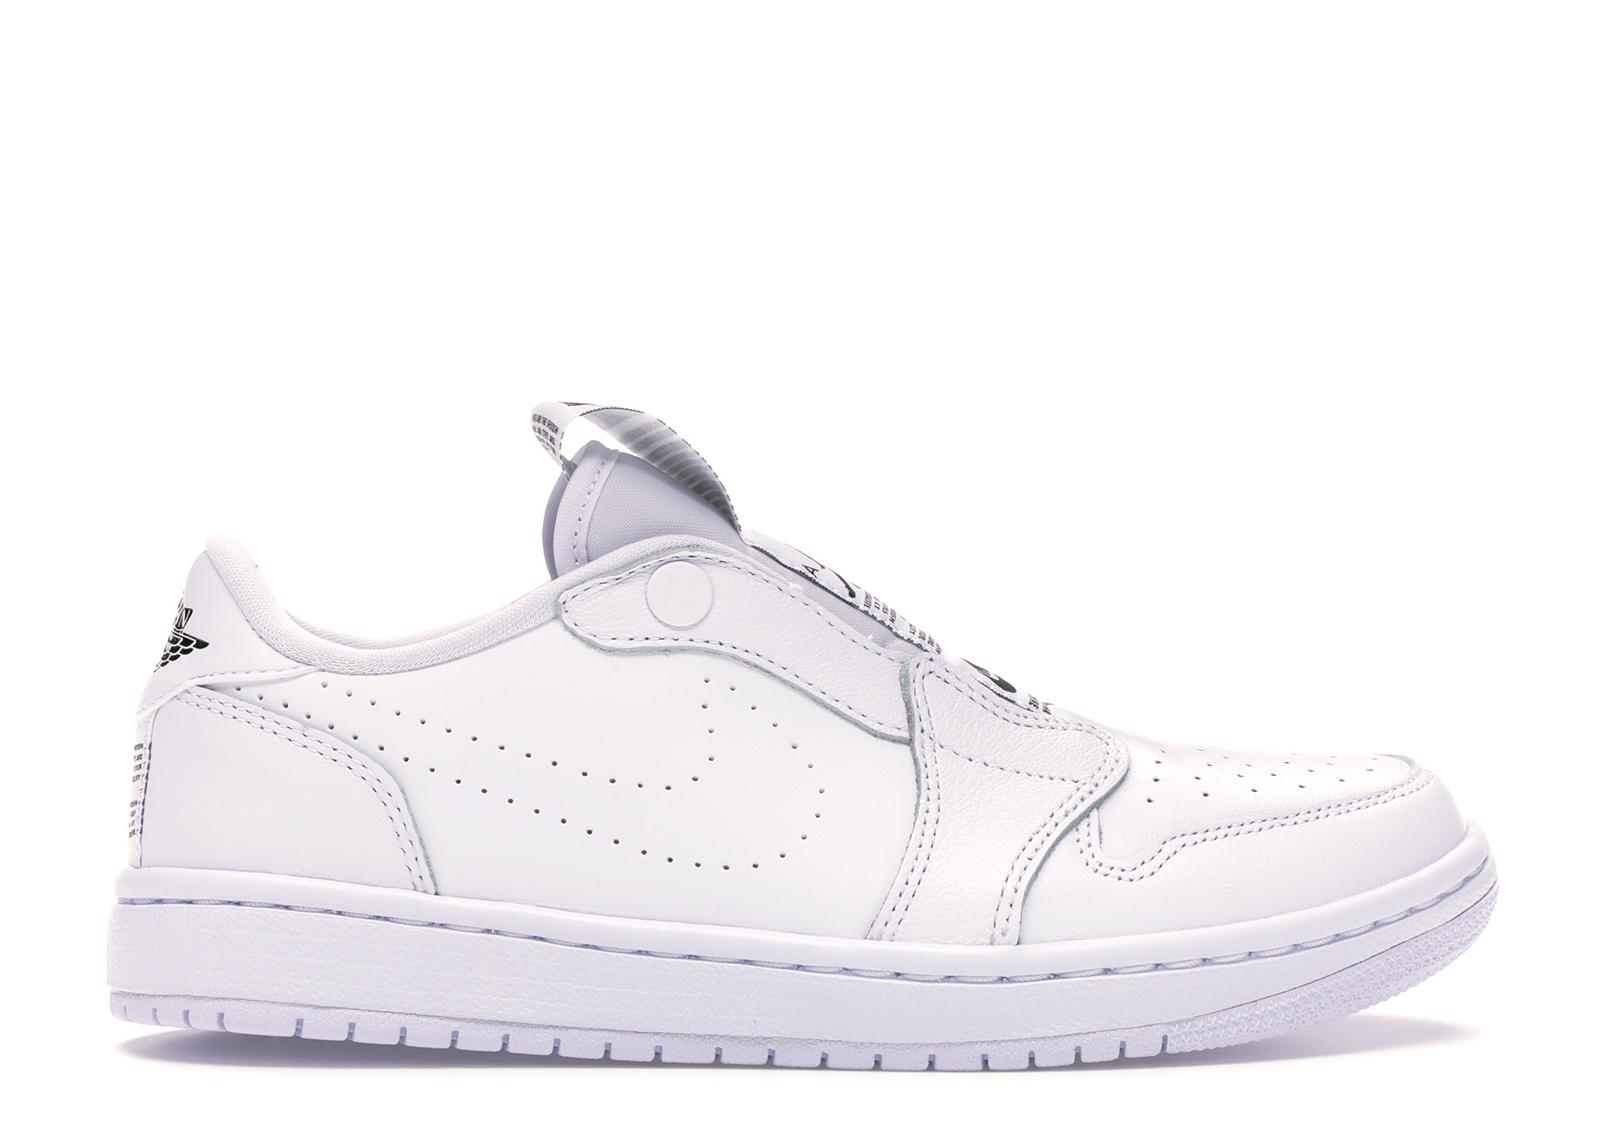 Jordan 1 Retro Low Slip White (W)